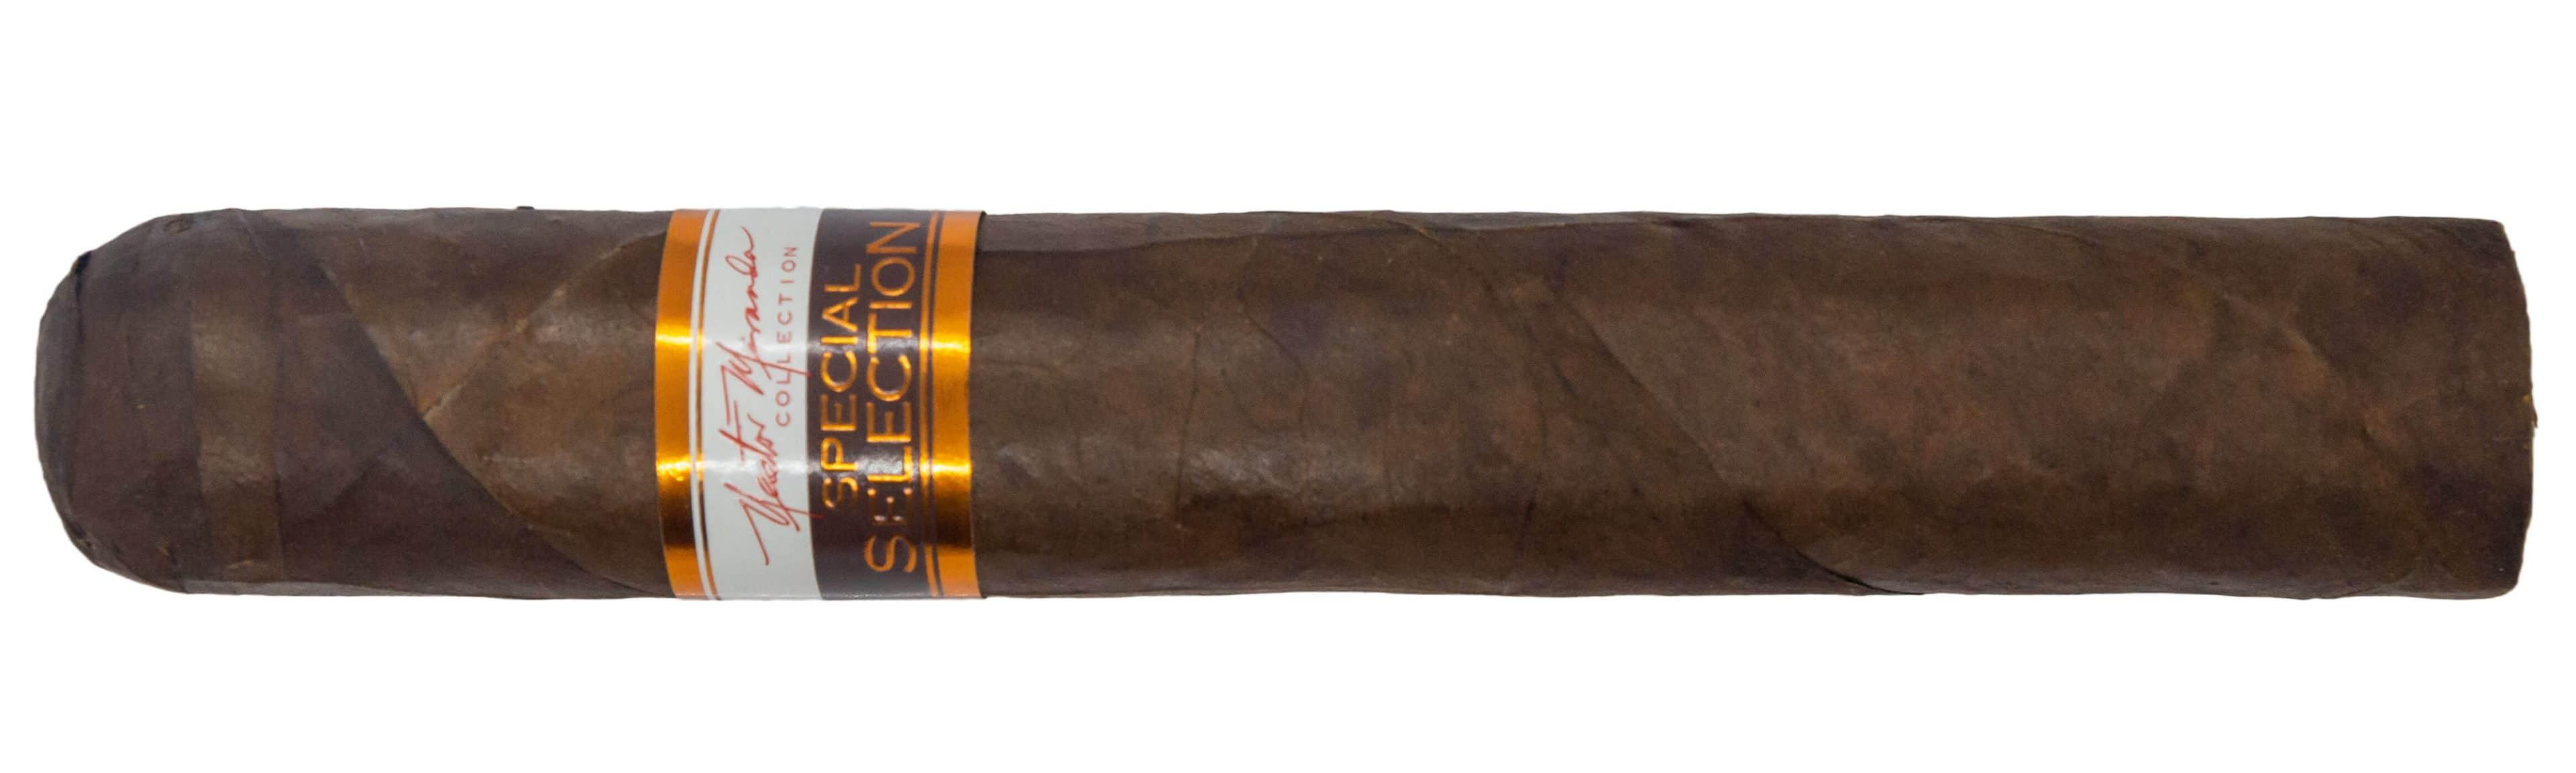 Blind Cigar Review: Nestor Miranda | Special Selection Toro